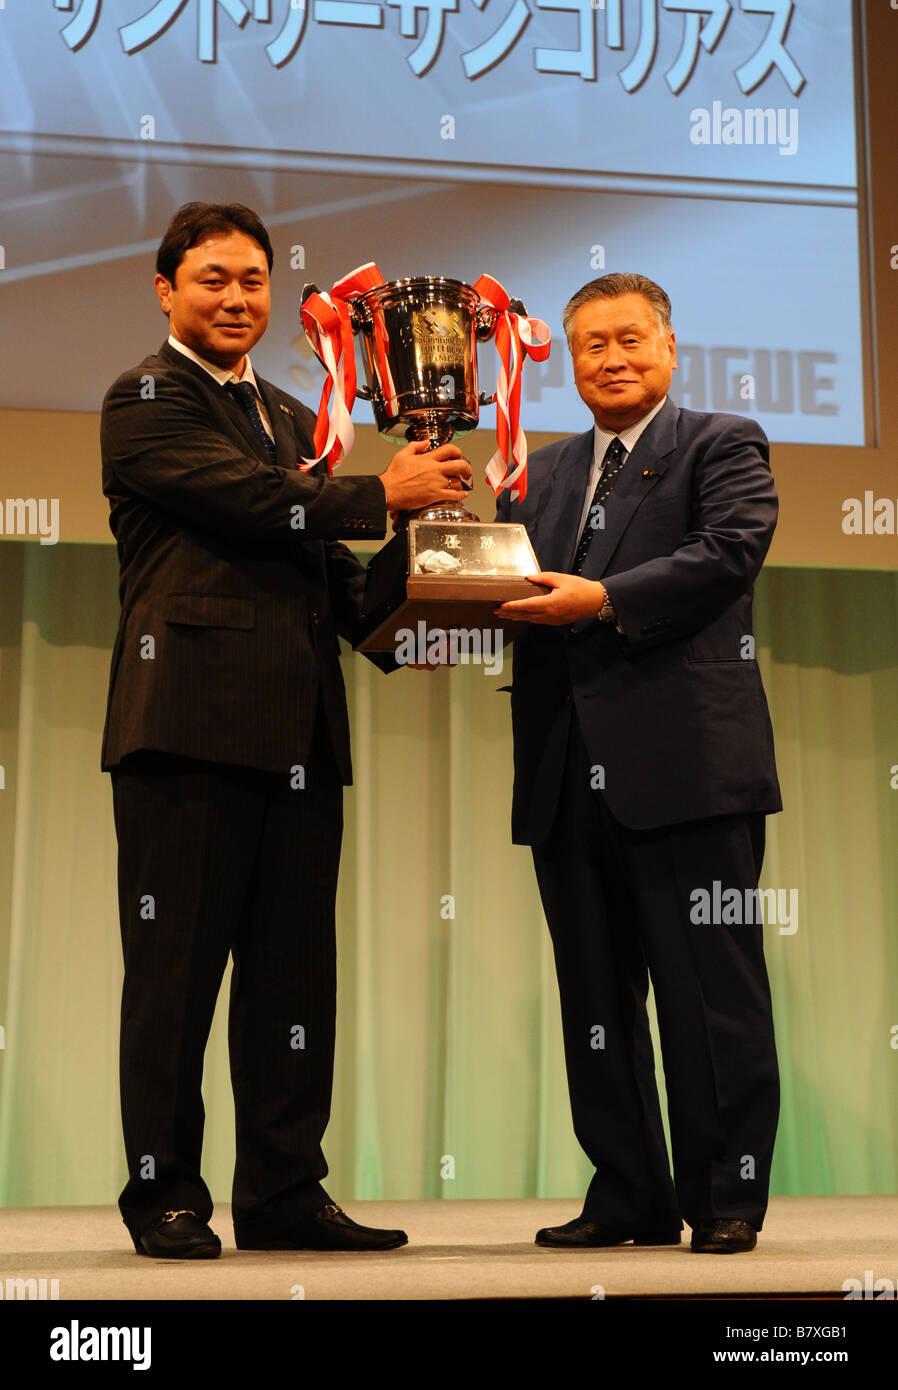 Katsuyuki Kiyomiya SUNTORY Yoshiro Mori President Japan Rugby Football Union AUGUST 29 2005 Rugby Japan Rugby Top - Stock Image